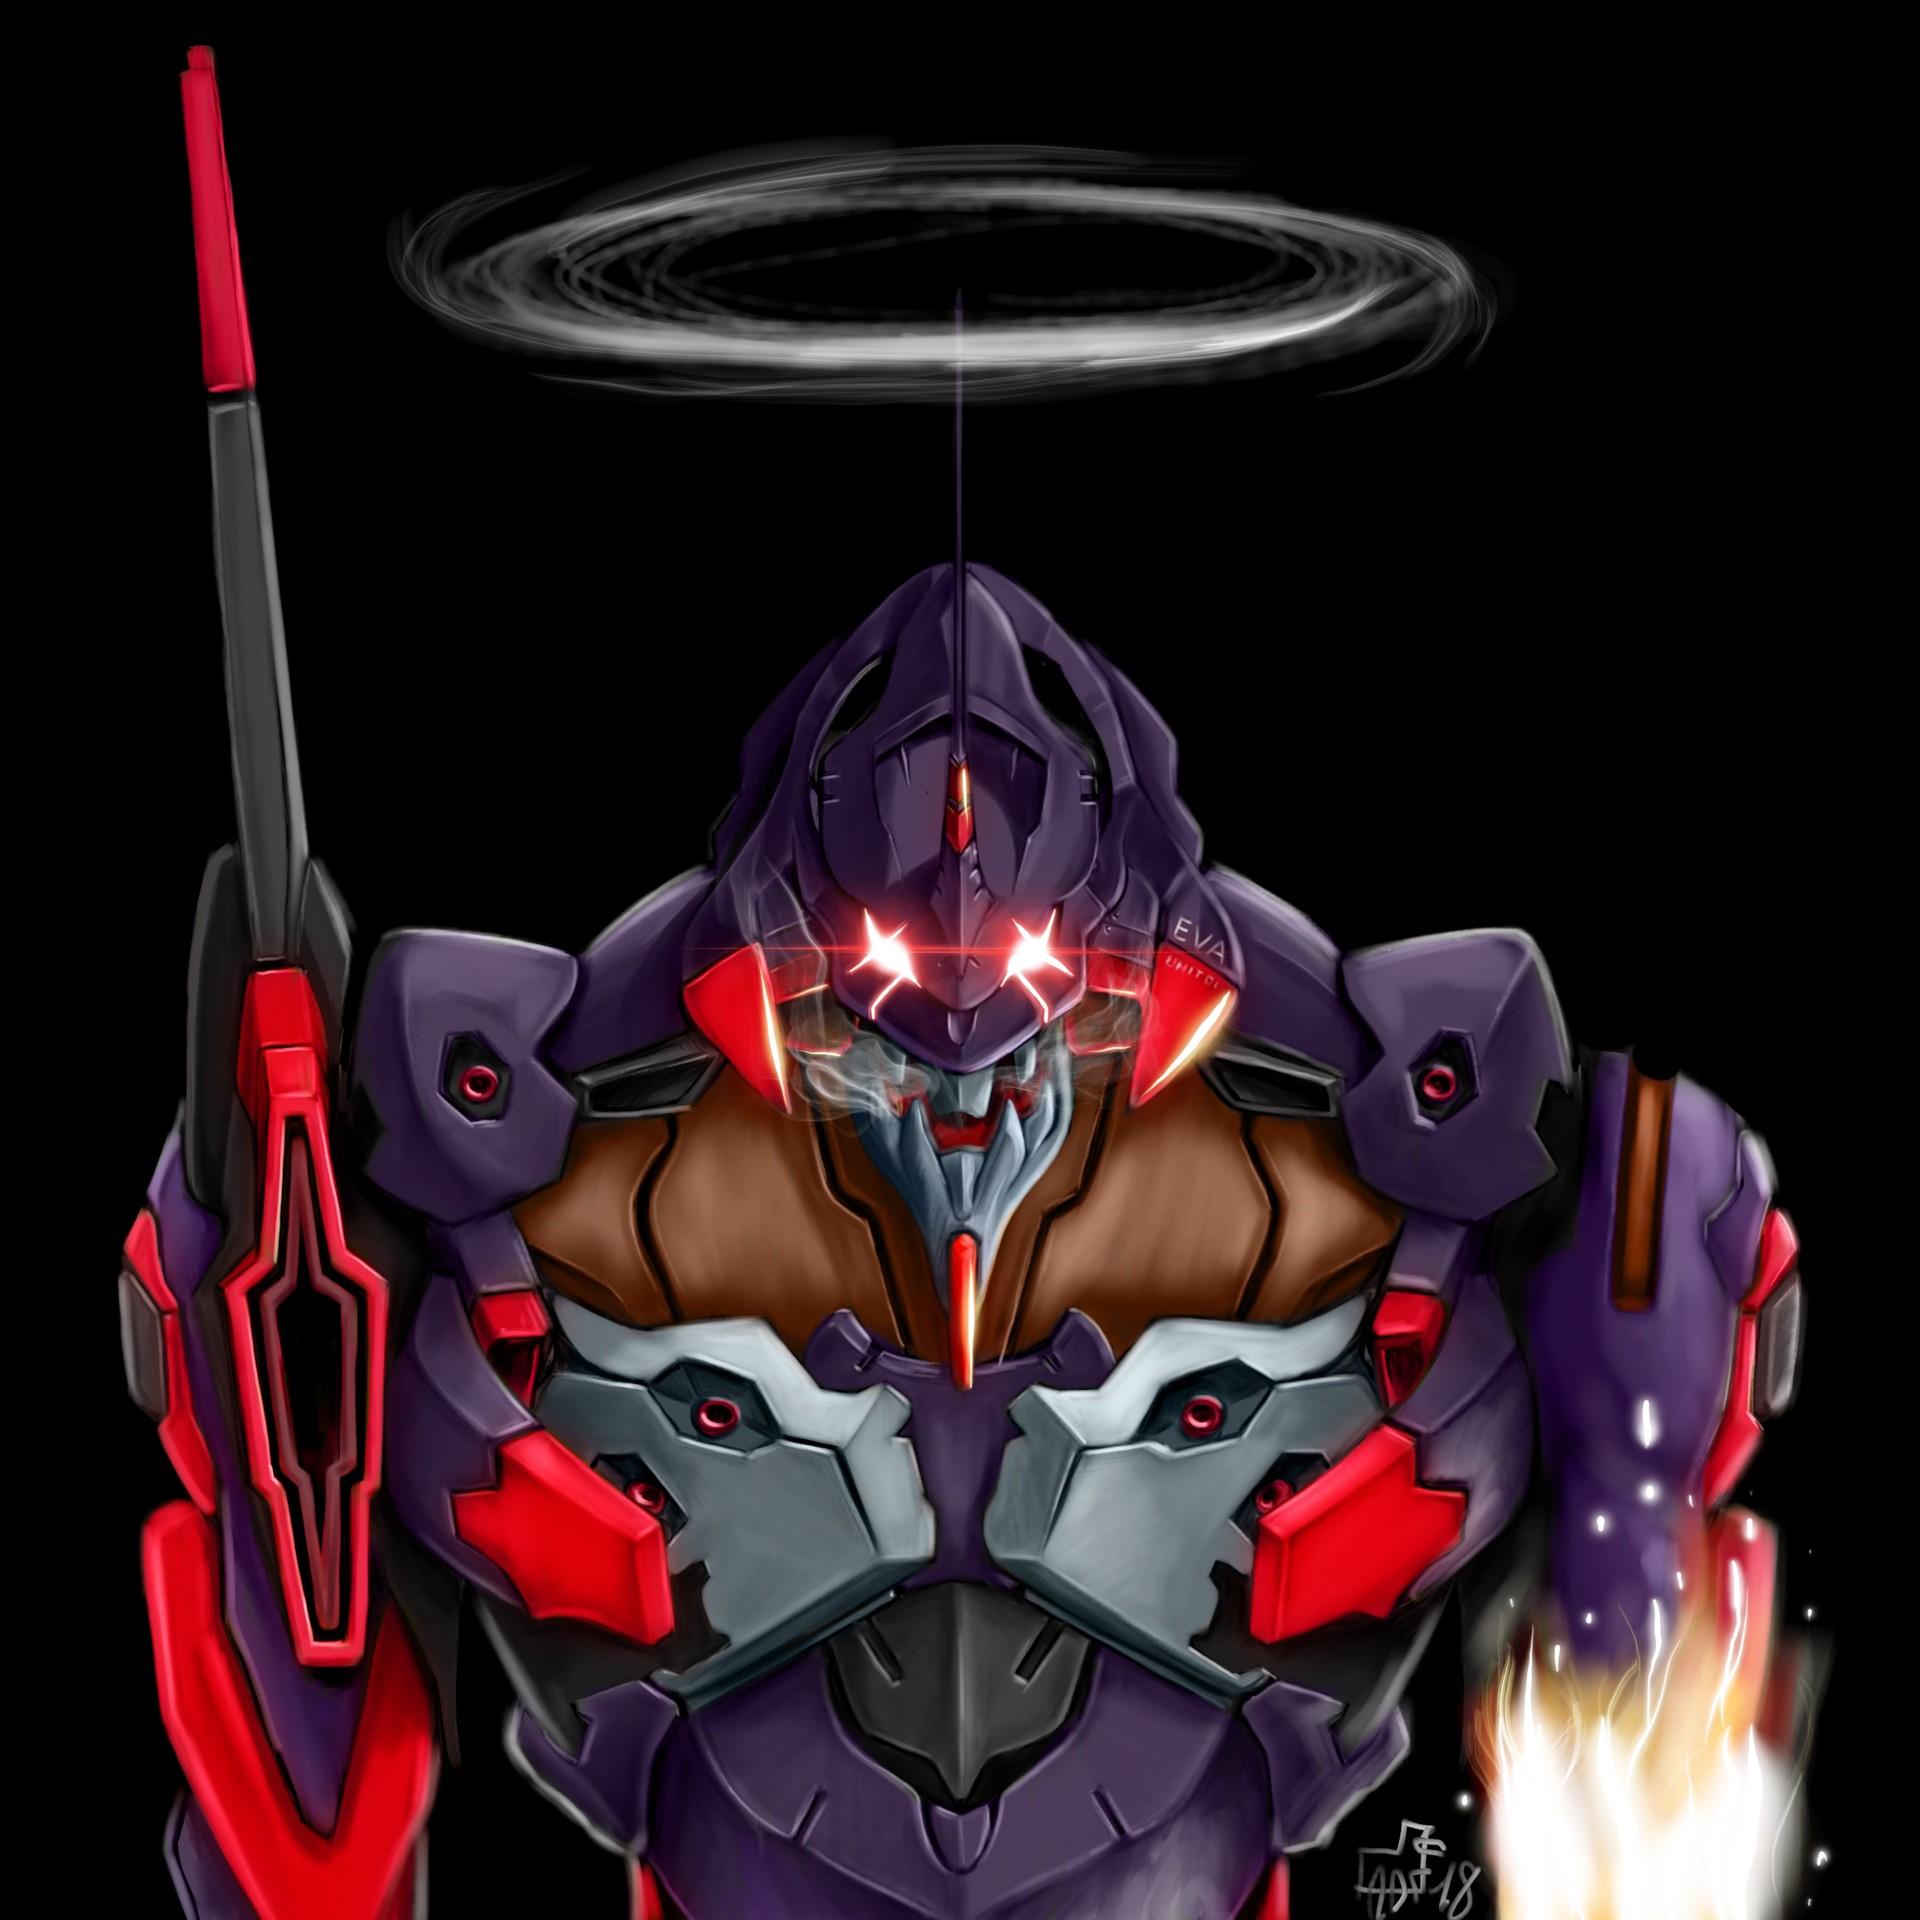 Evangelion Eva 01 Berserk